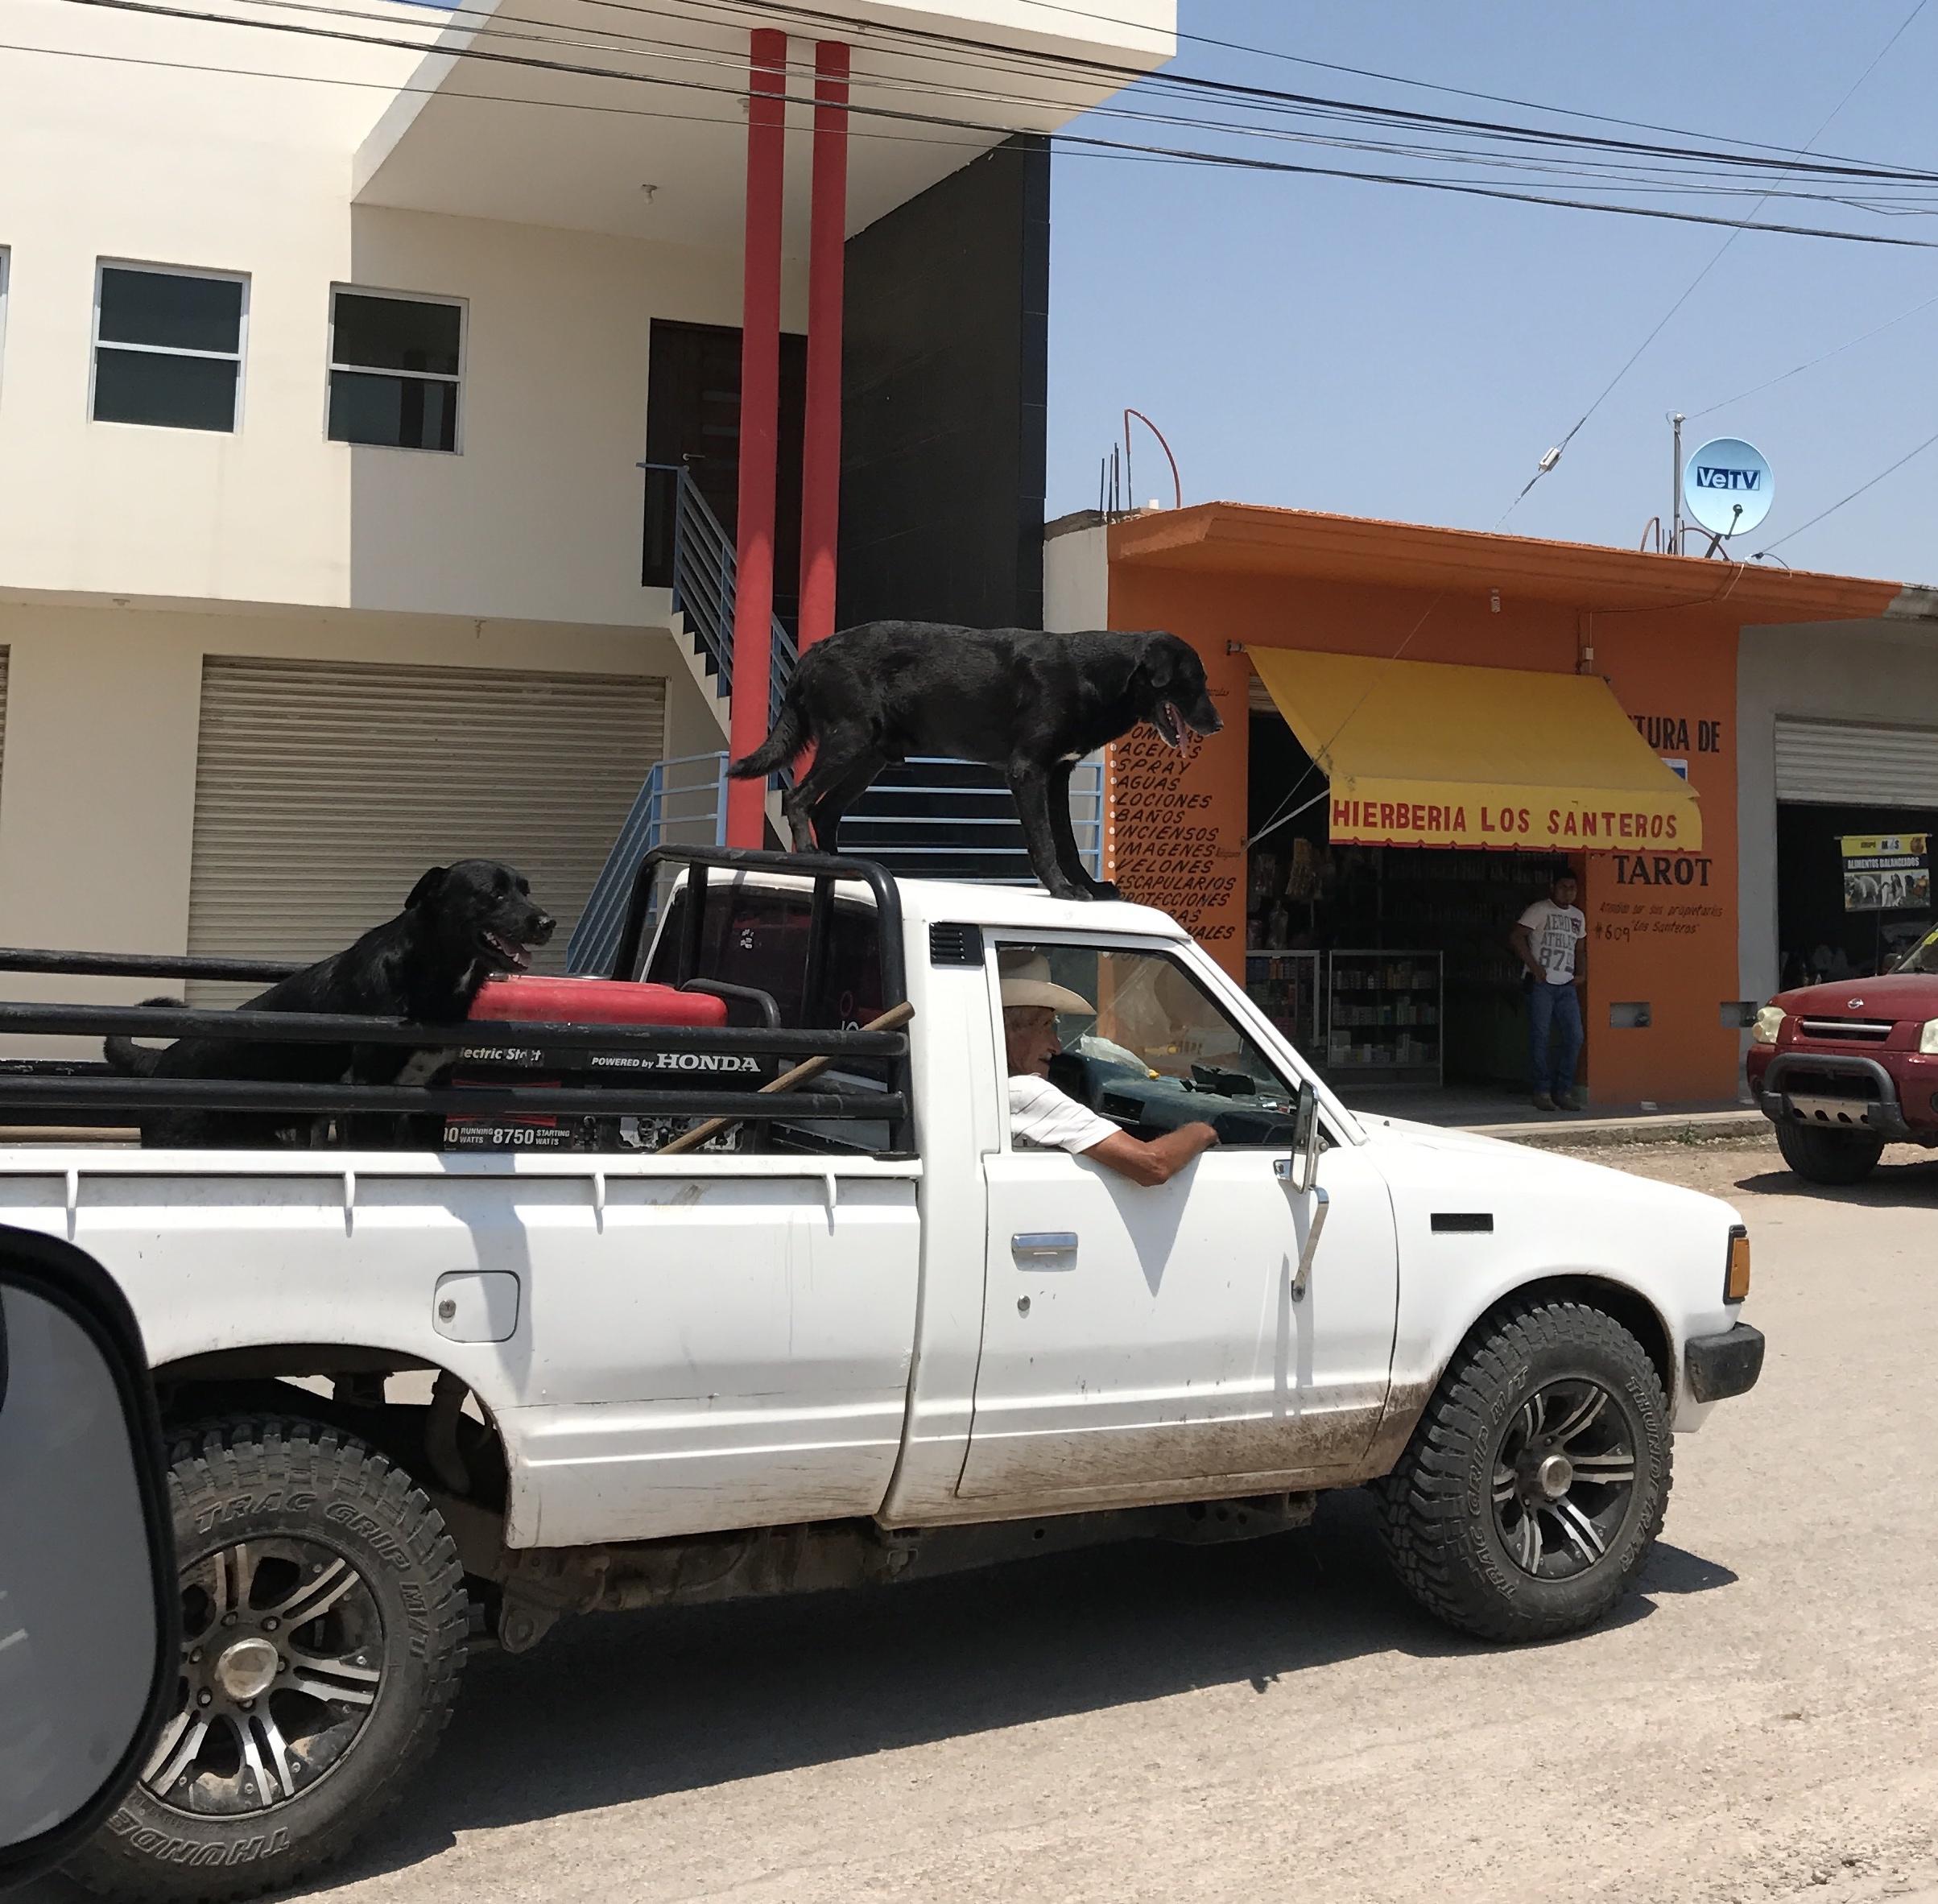 dogs surfing on truck.jpg